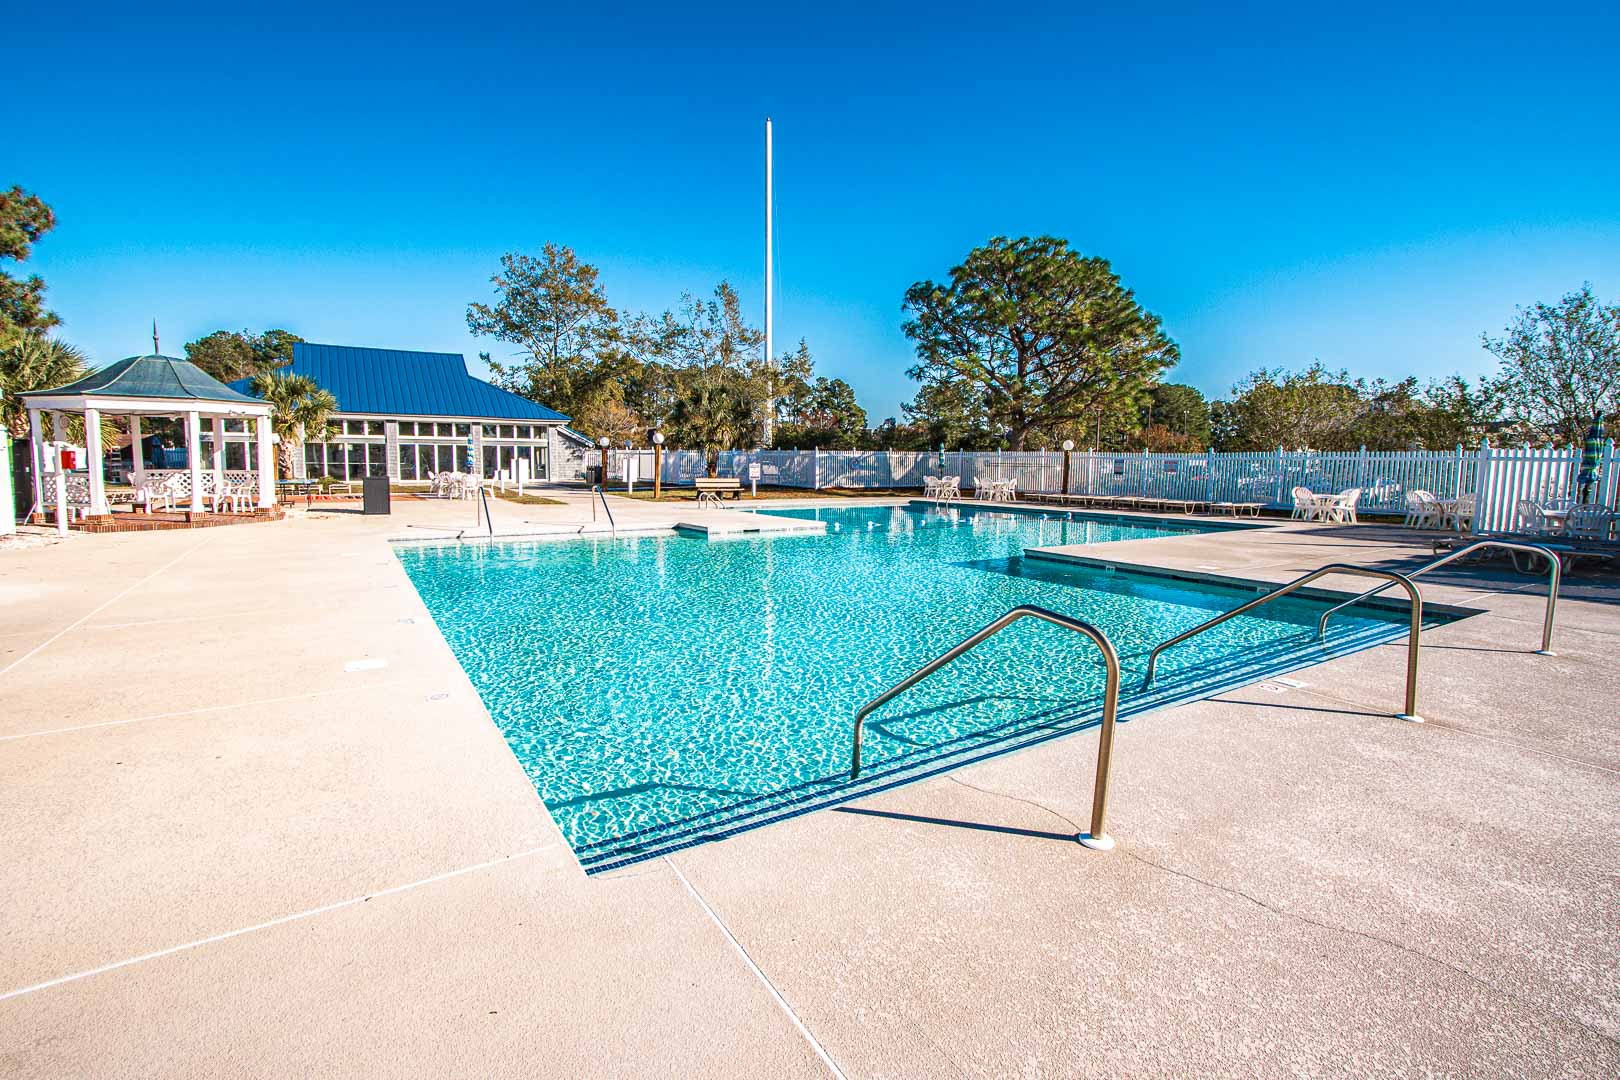 An outdoor swimming pool at VRI's Waterwood Townhomes in New Bern, North Carolina.